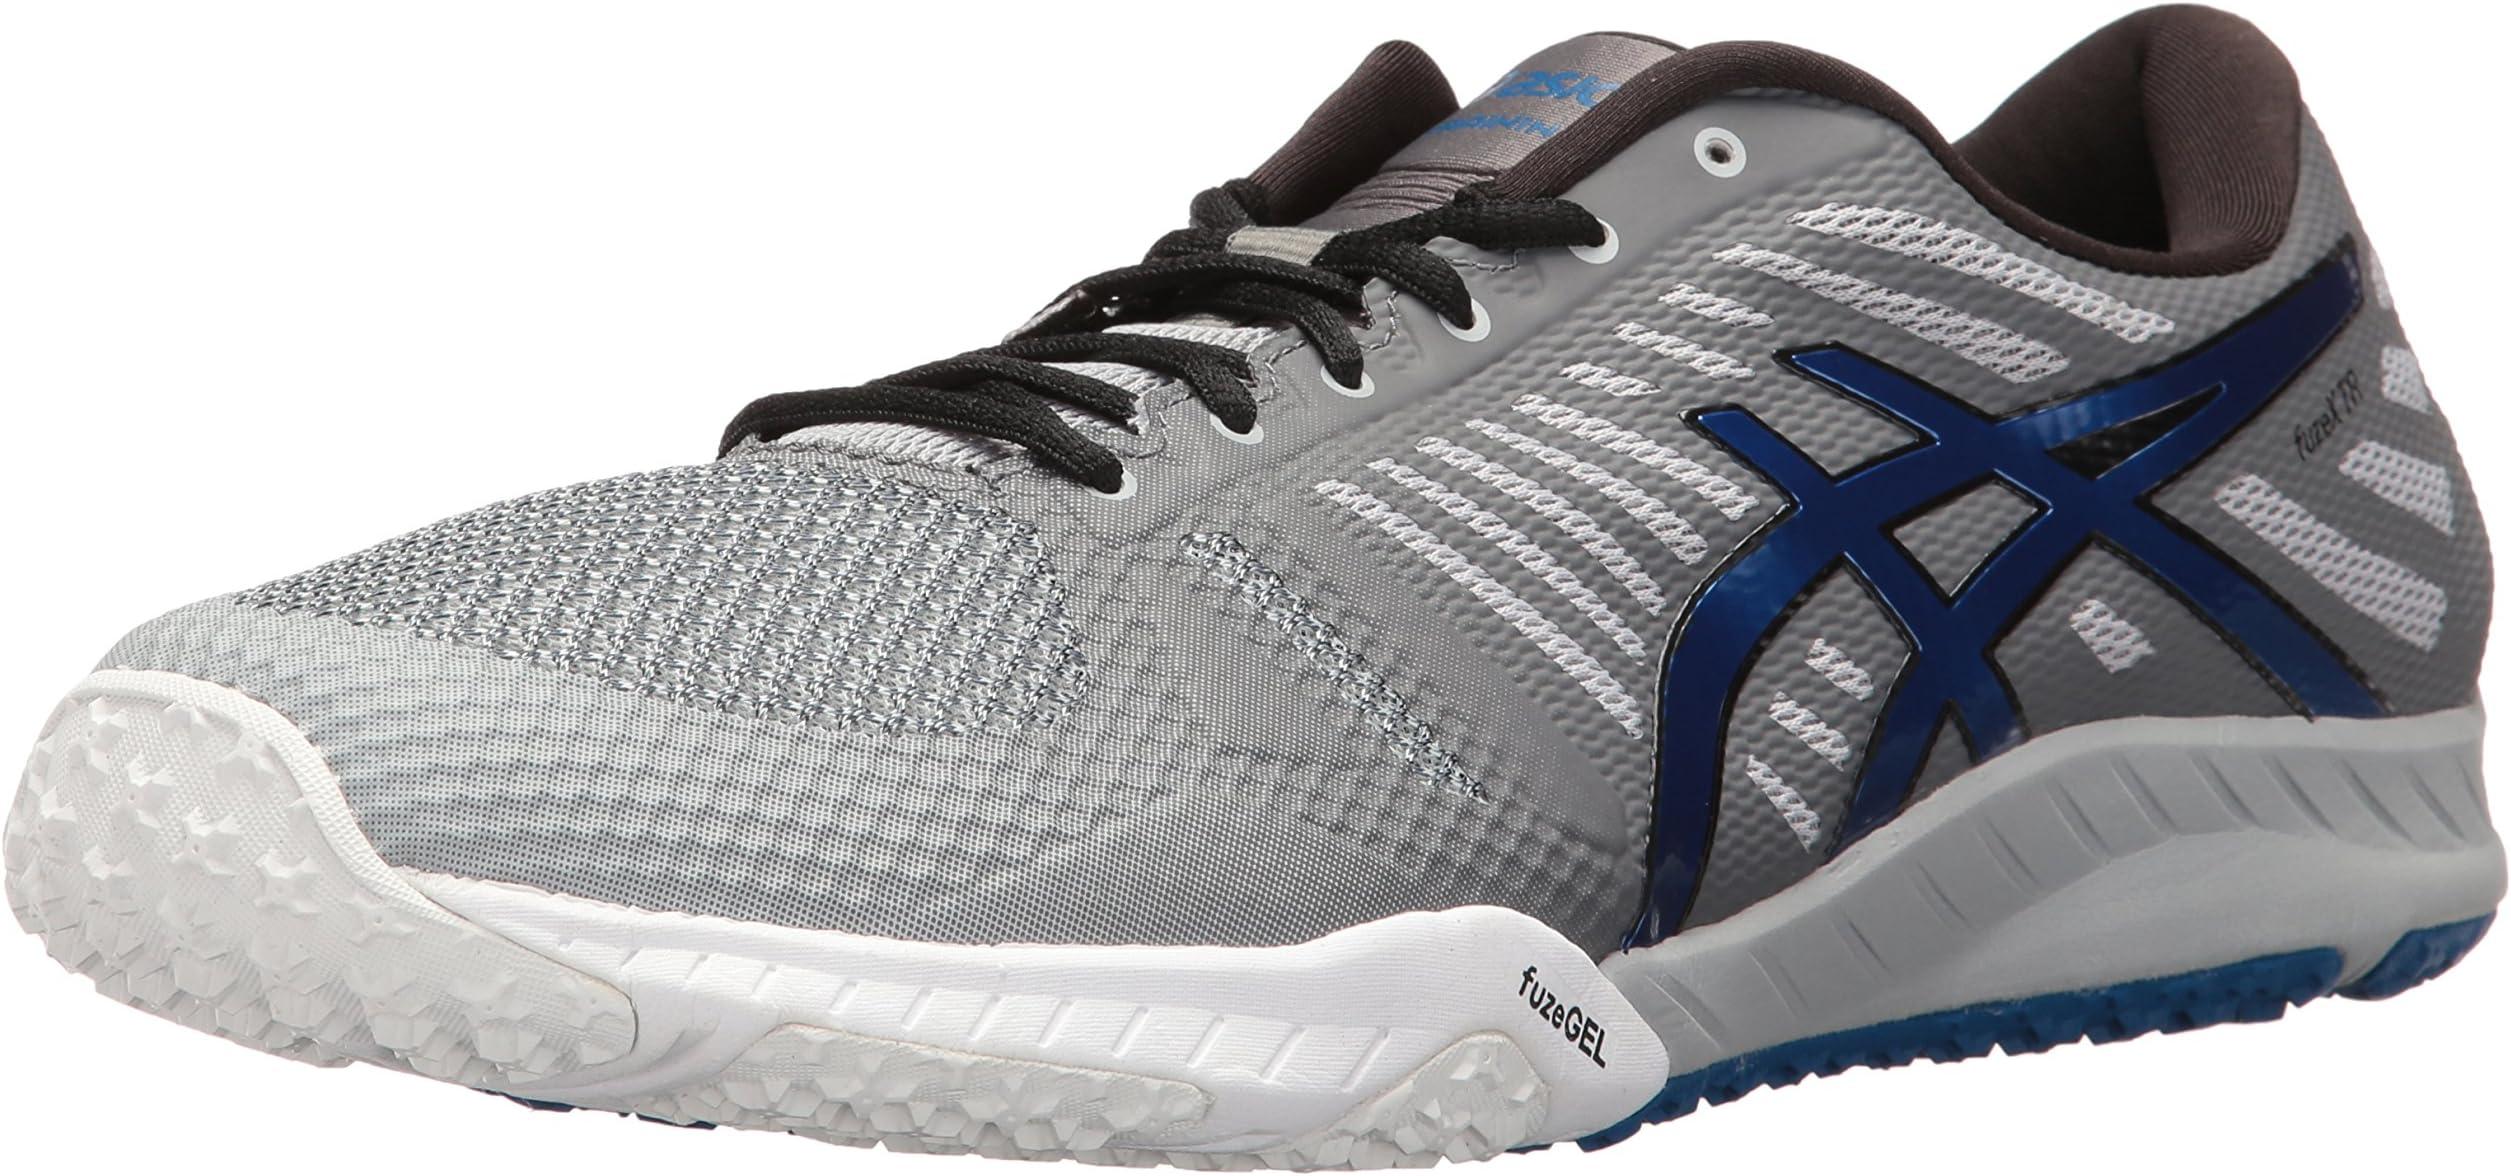 Asics Fuzex Tr Running Shoes for Men